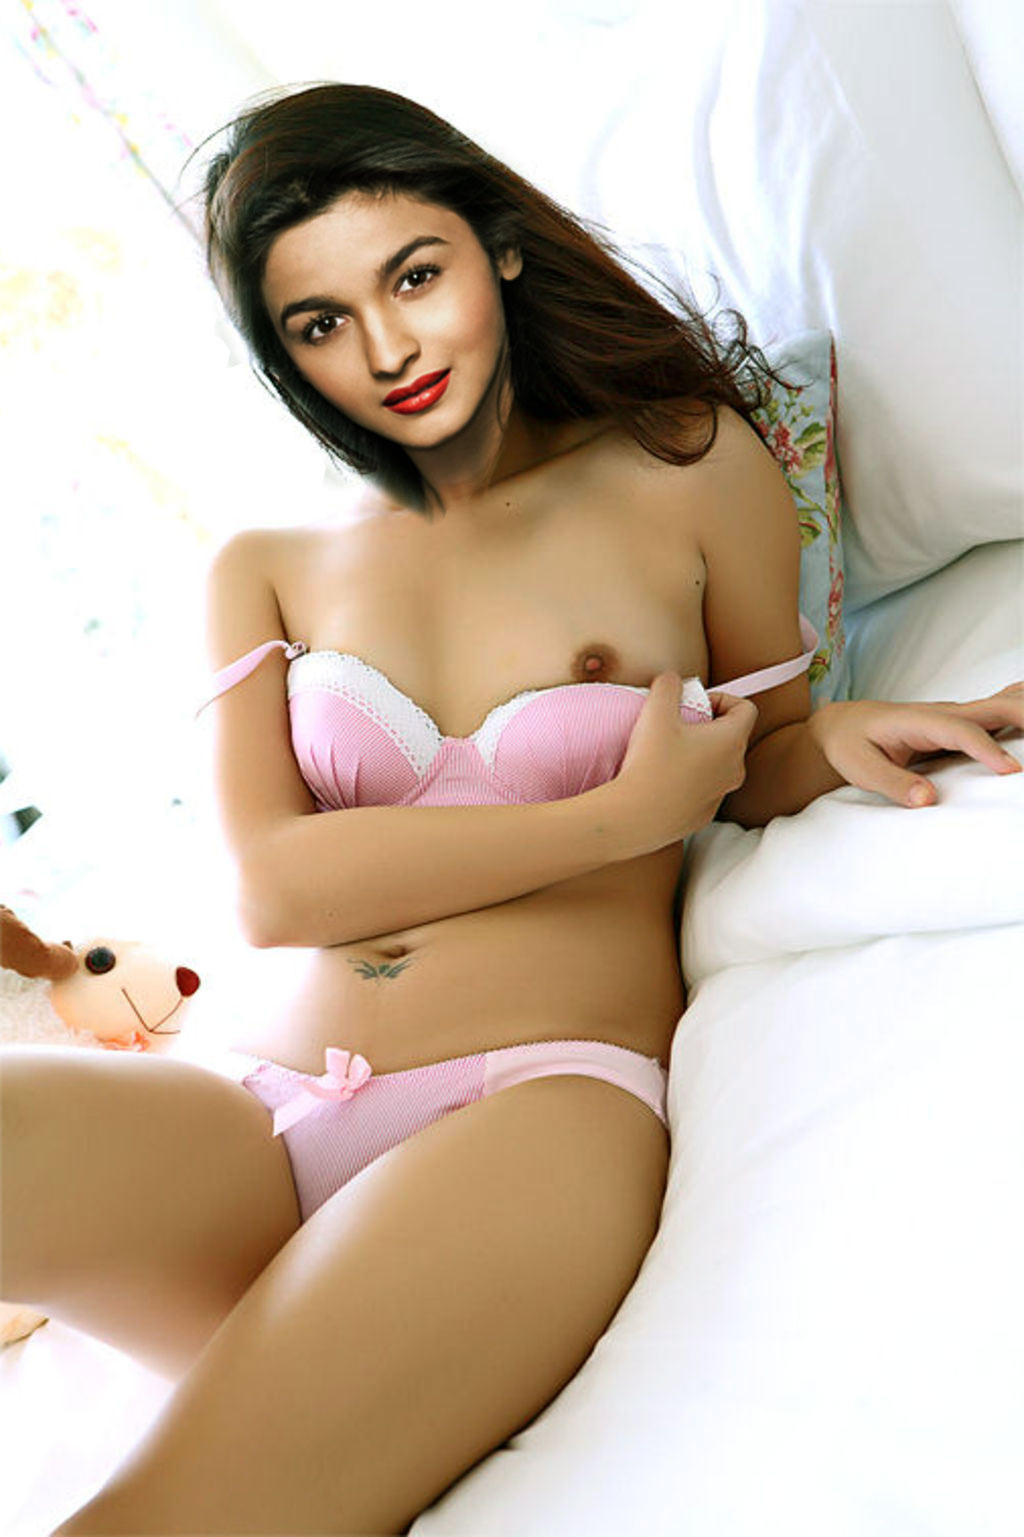 Fucking Images Of Alia Bhat alia bhatt nude porn sex xxx photos • sexdug